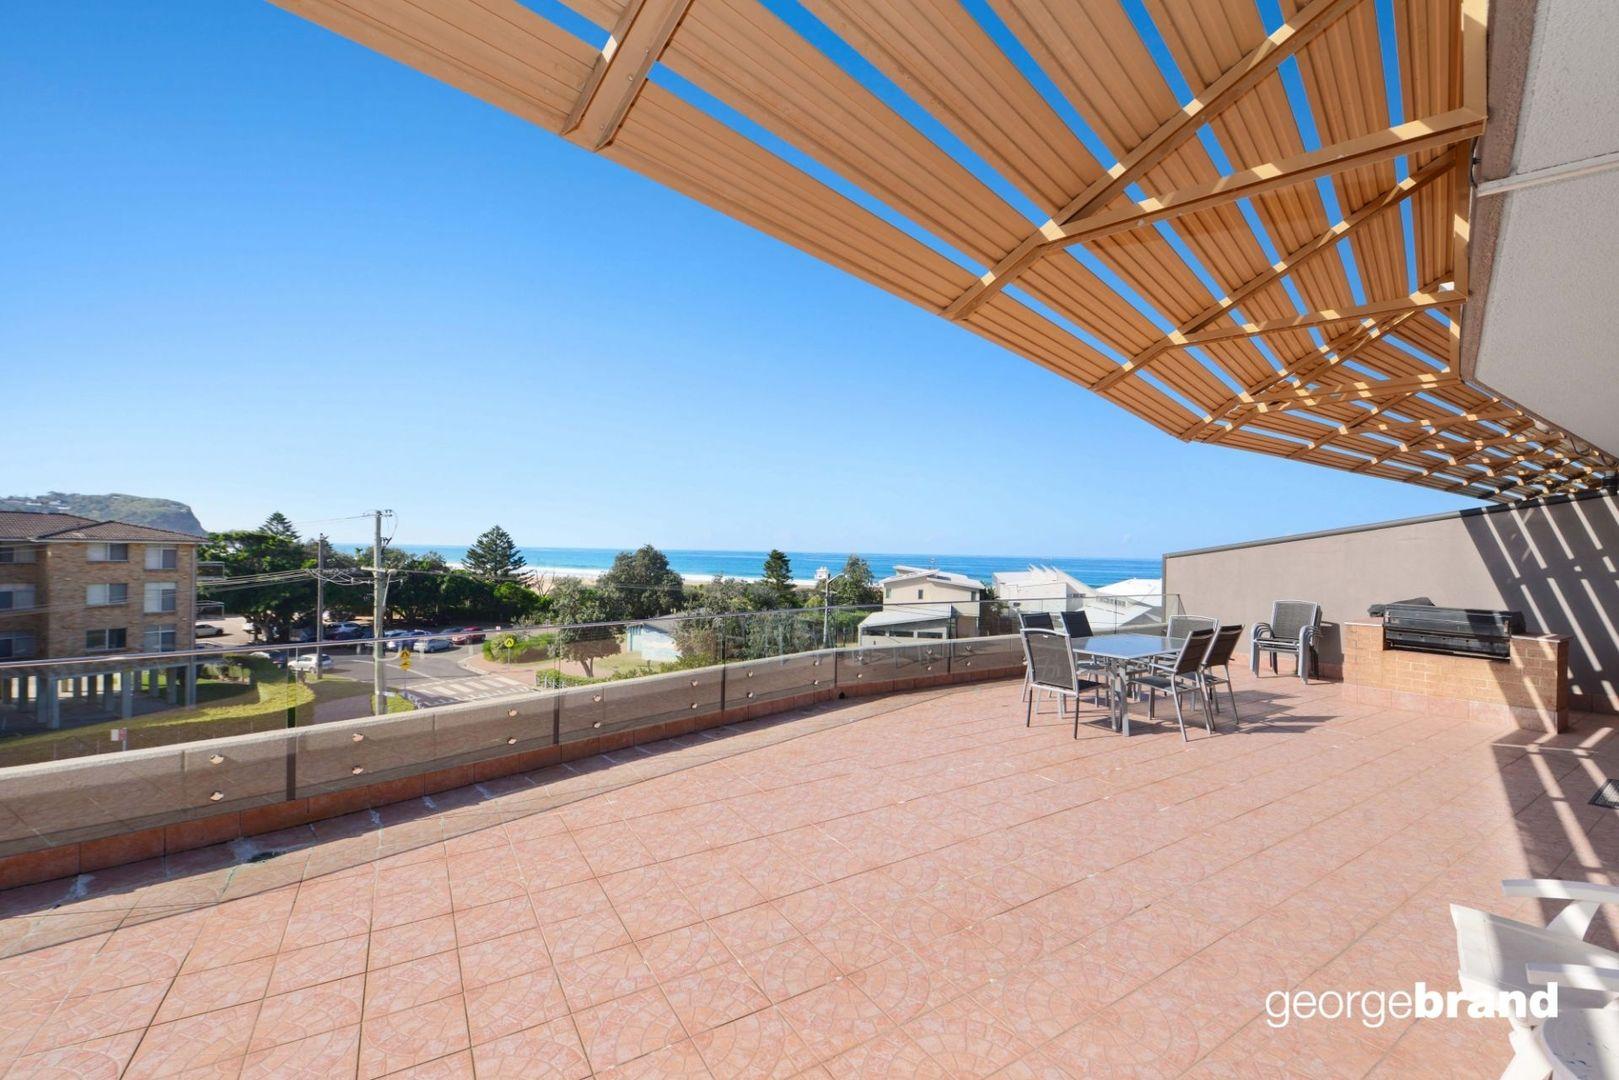 8/170 Avoca Dr, Avoca Beach NSW 2251, Image 0